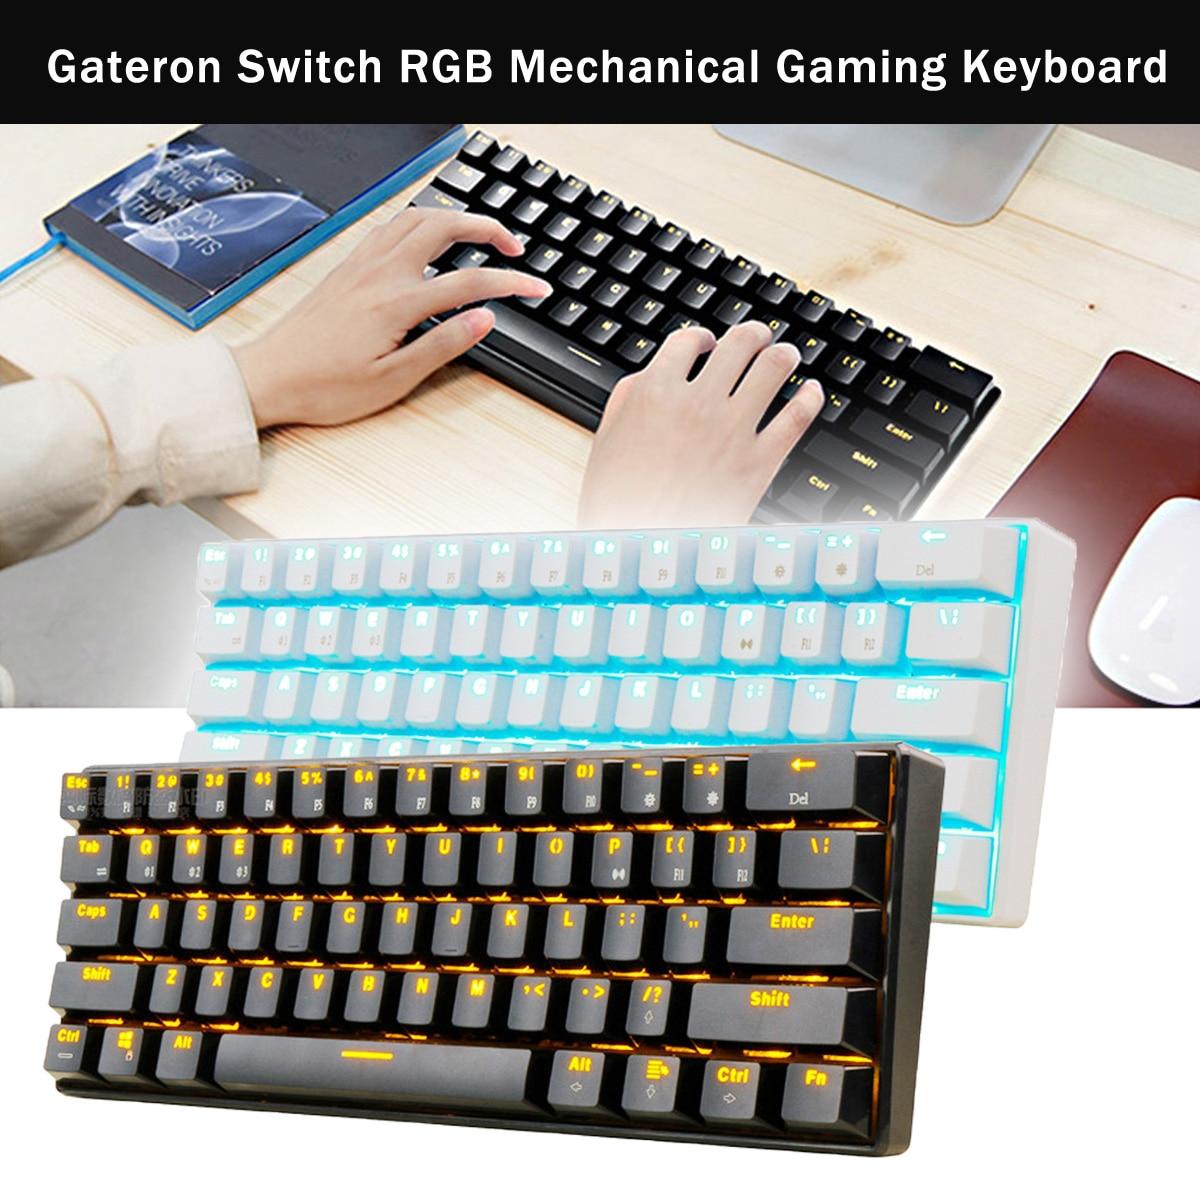 Gateron Switch RGB Mechanical Gaming Keyboard Bluetooth LED Backlit Waterproof for Desktop English Layout 61 keys mini mechanical keyboard anne pro bluetooth rgb gateron switch brown gaming keyboard bt4 0 wireless programmable